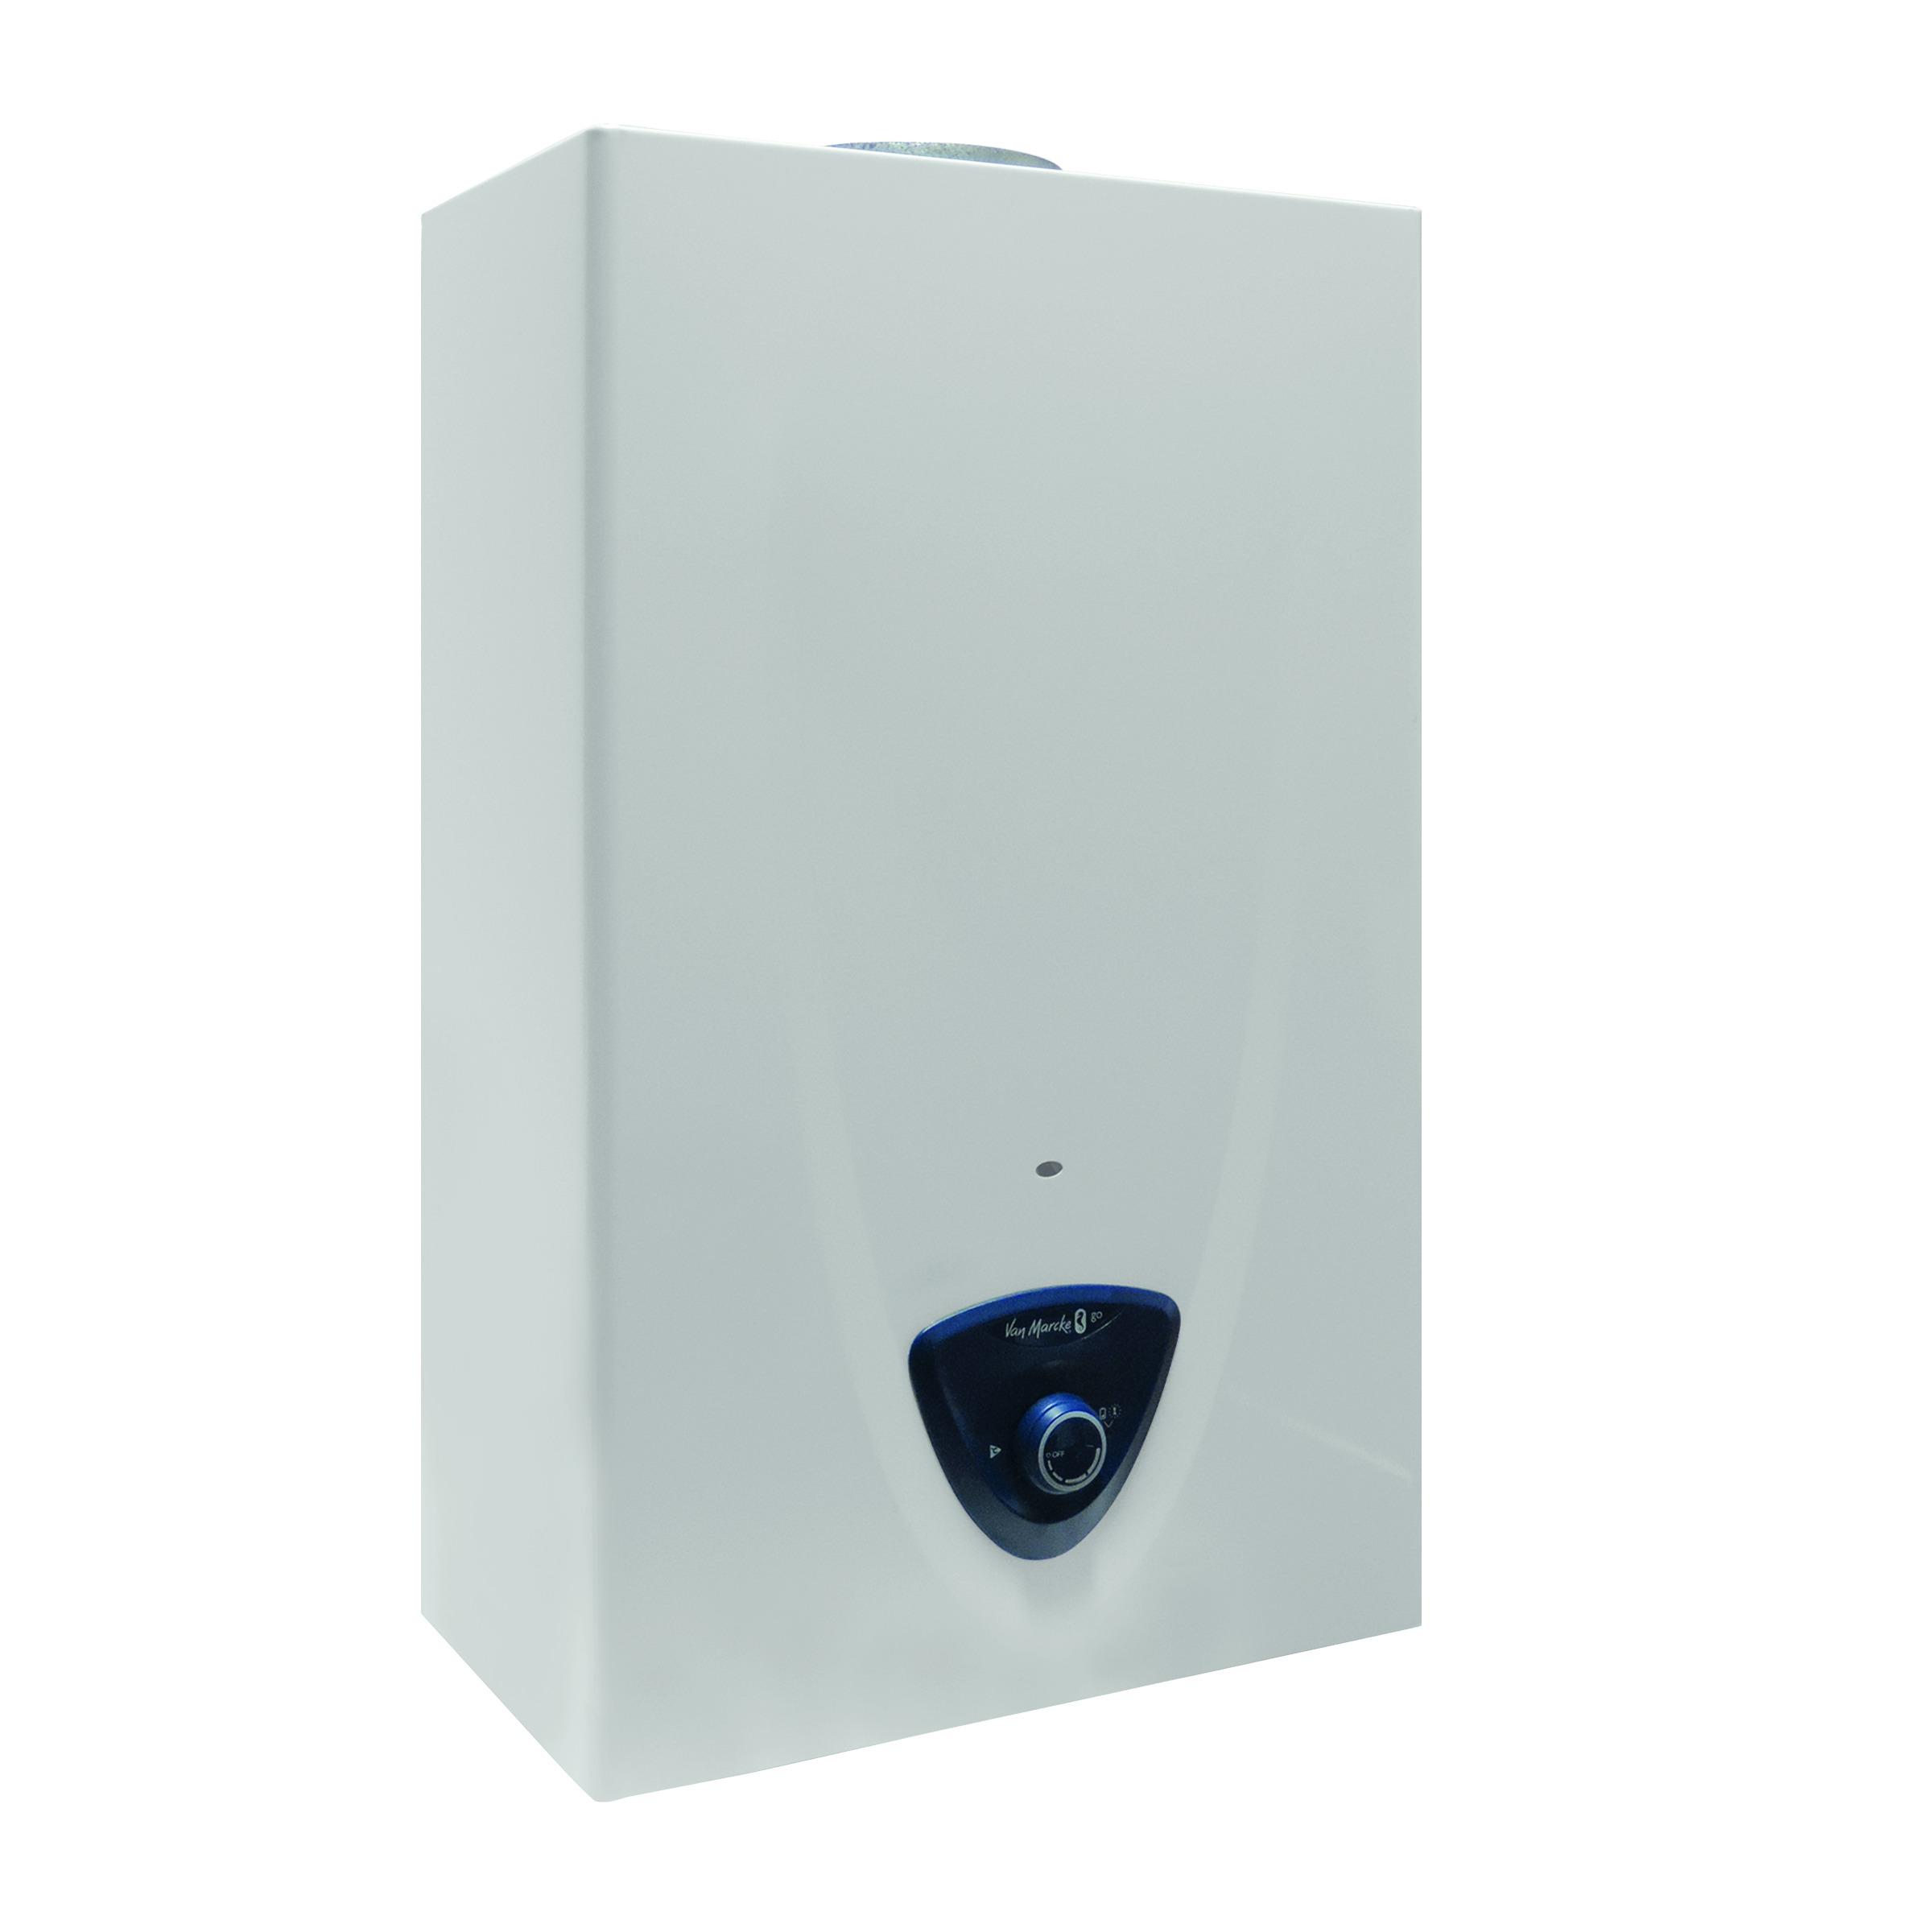 chauffe eau gaz butane propane 14l van marcke go chauffe eau accessoires chauffage central. Black Bedroom Furniture Sets. Home Design Ideas